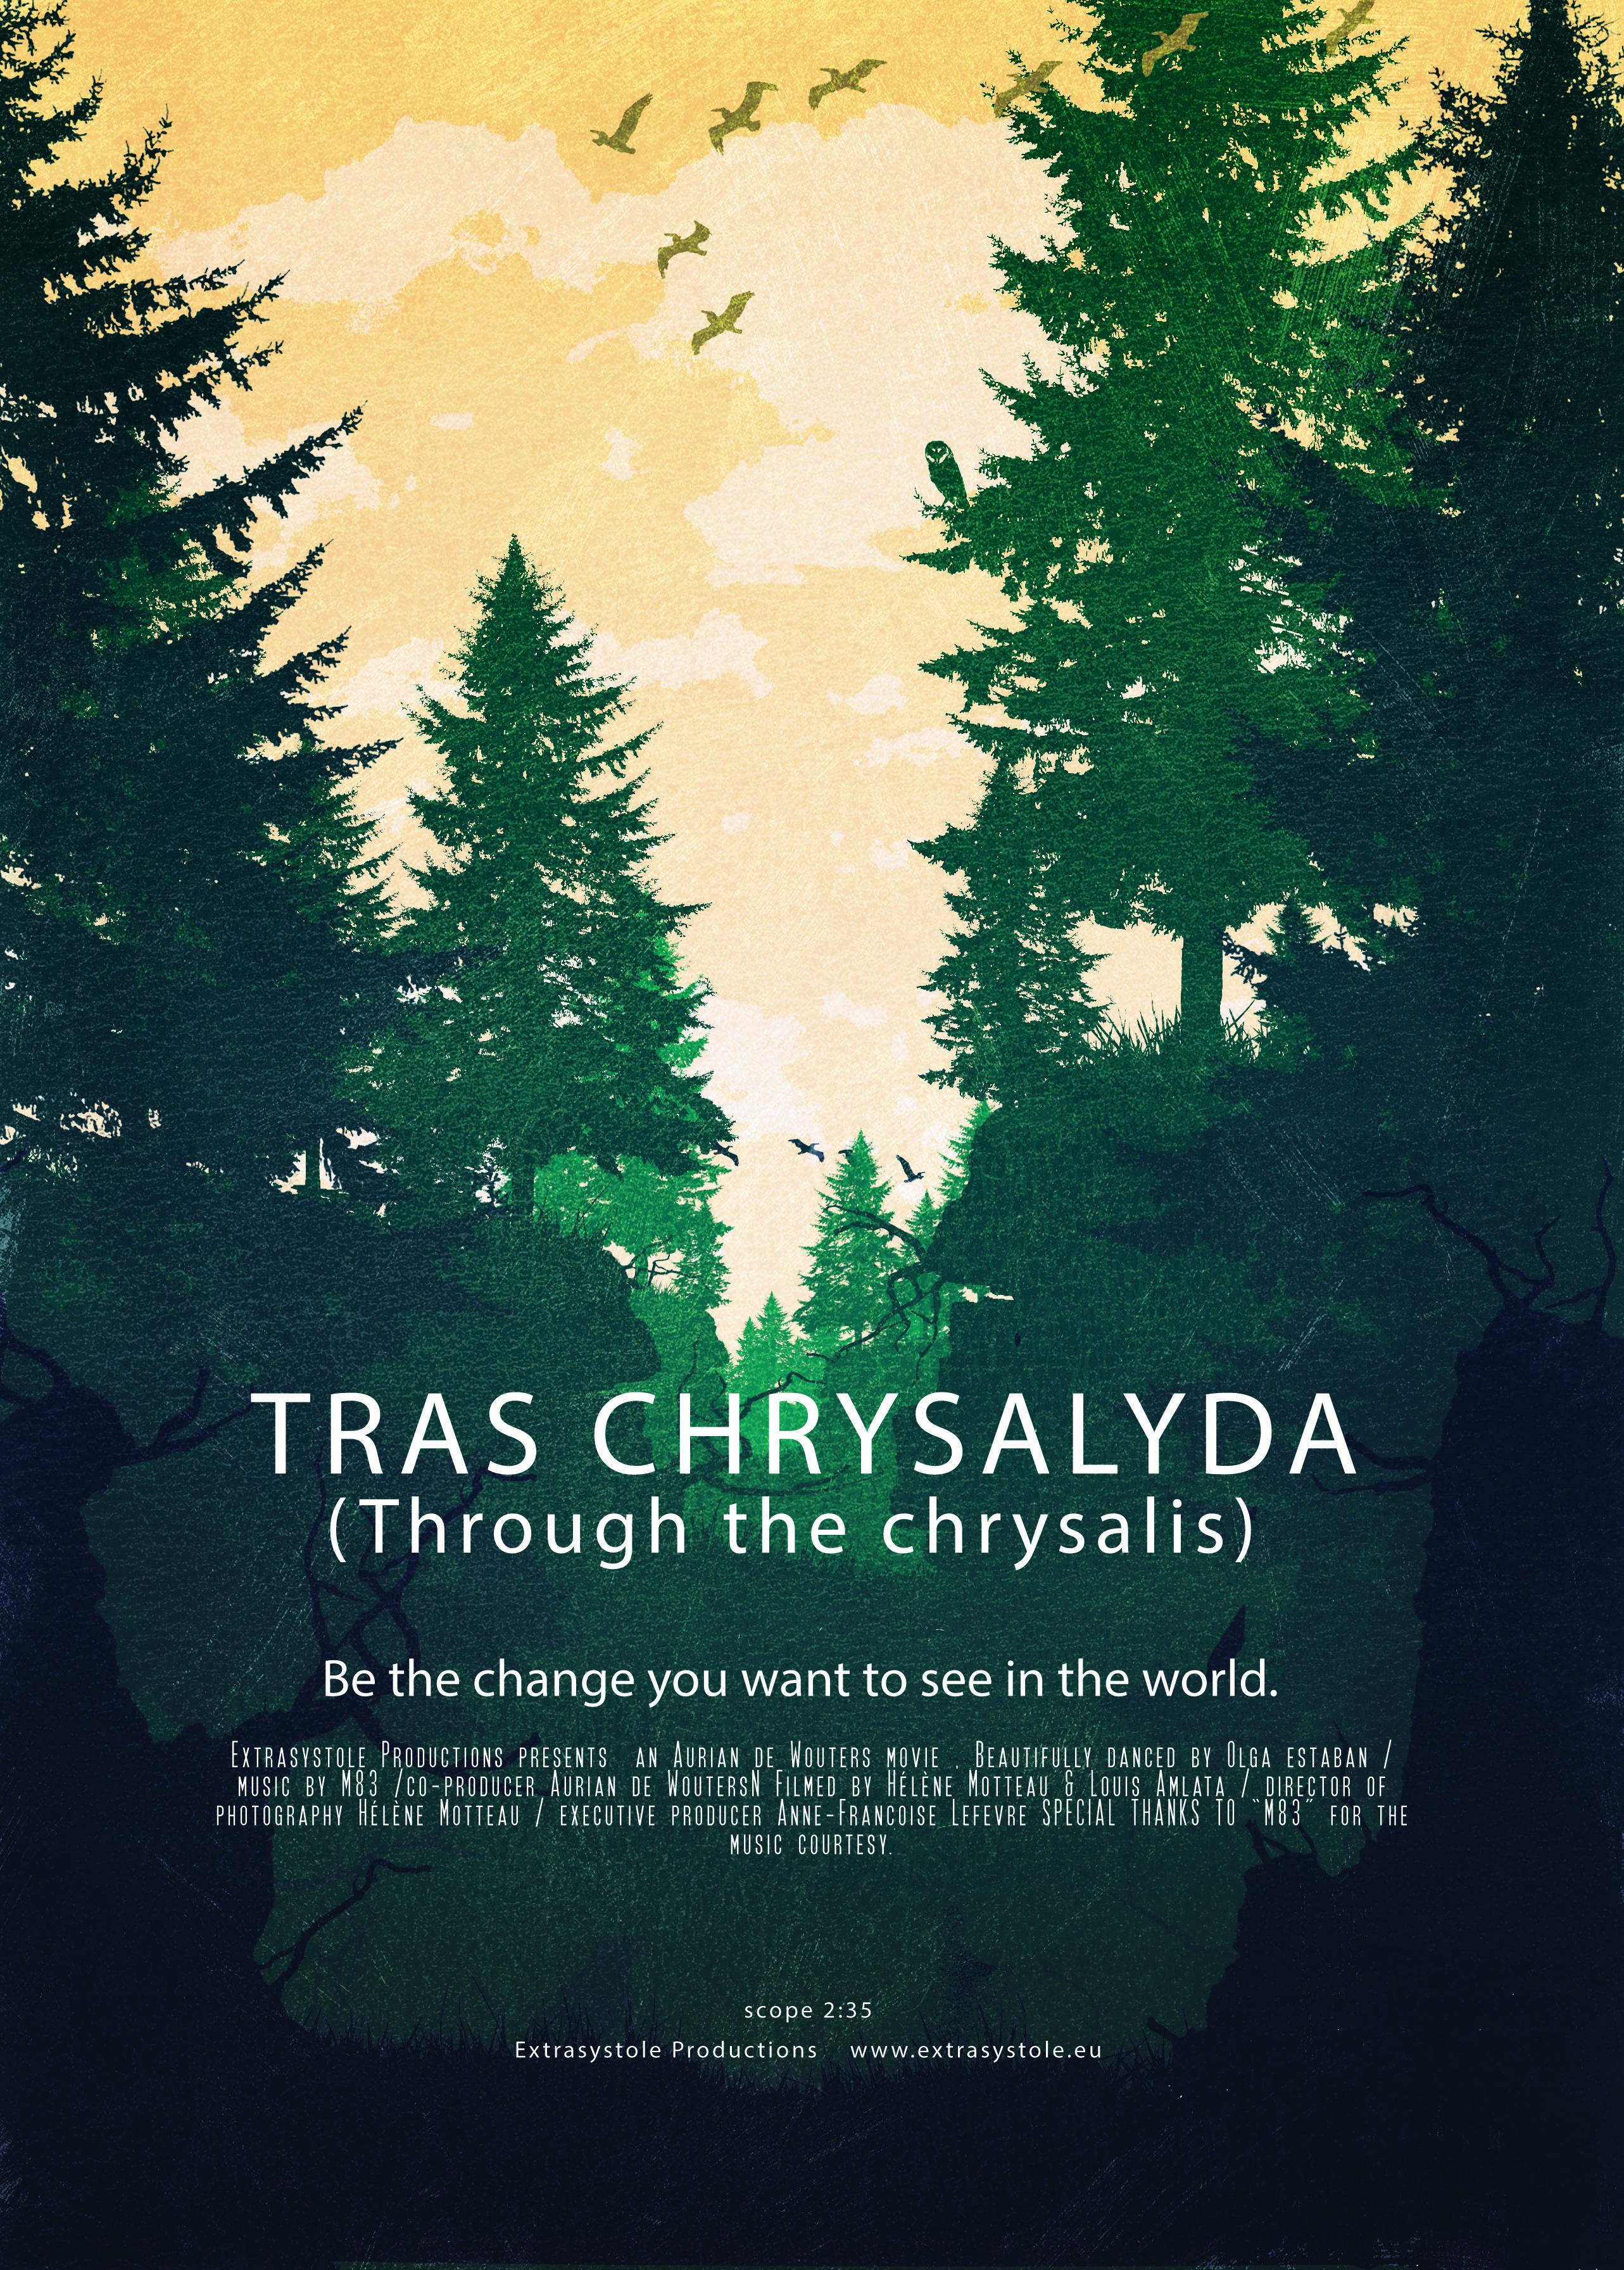 Tras Chrysalyda